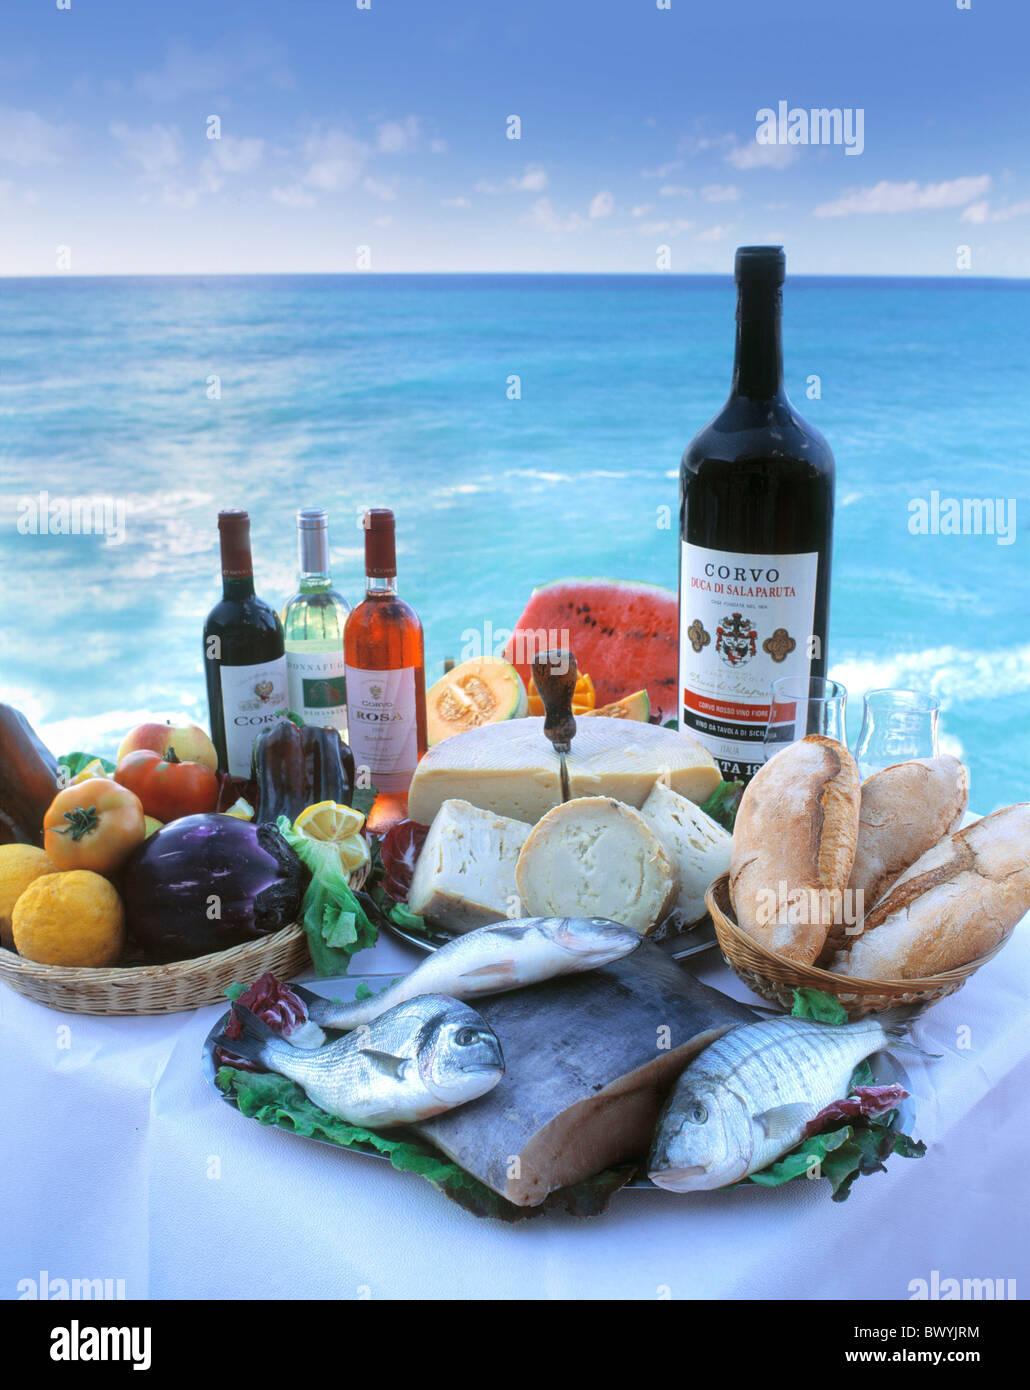 bread cheese coast Corvo wine cuisine fish food Italy Europe kitchen ...